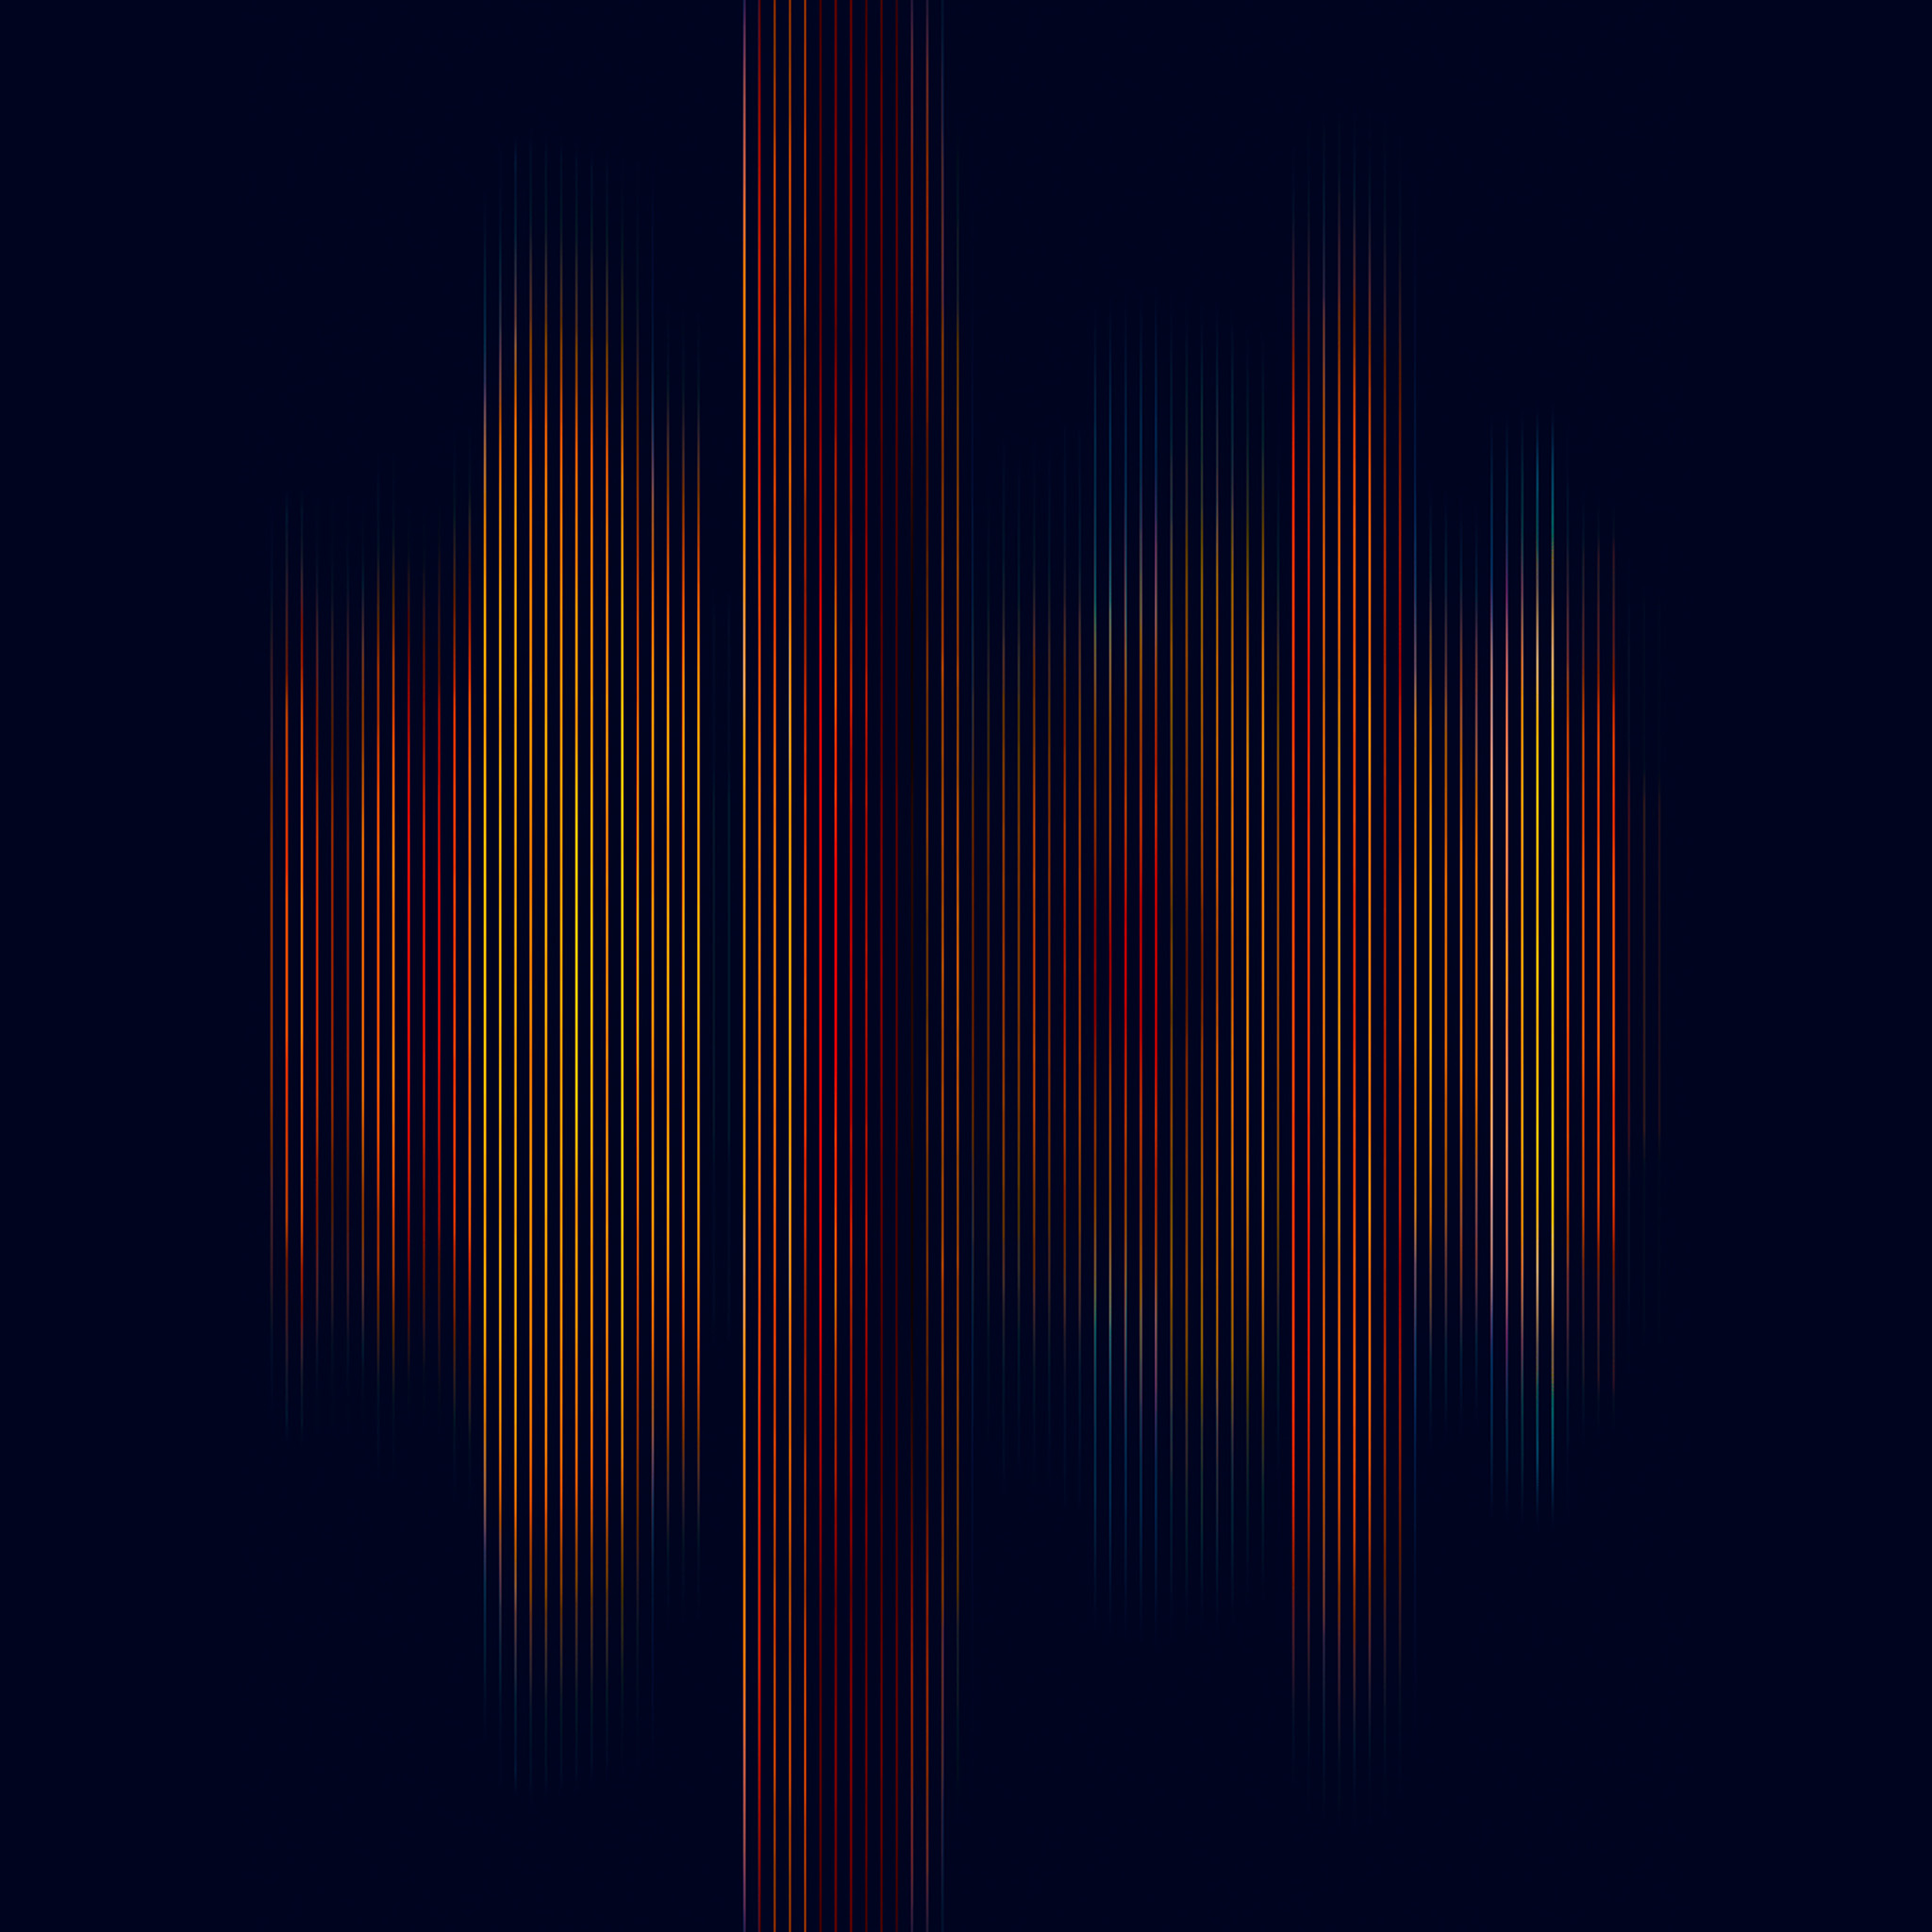 Line Drawing Wallpaper : Freeios iphone wallpaper vy line art dark city